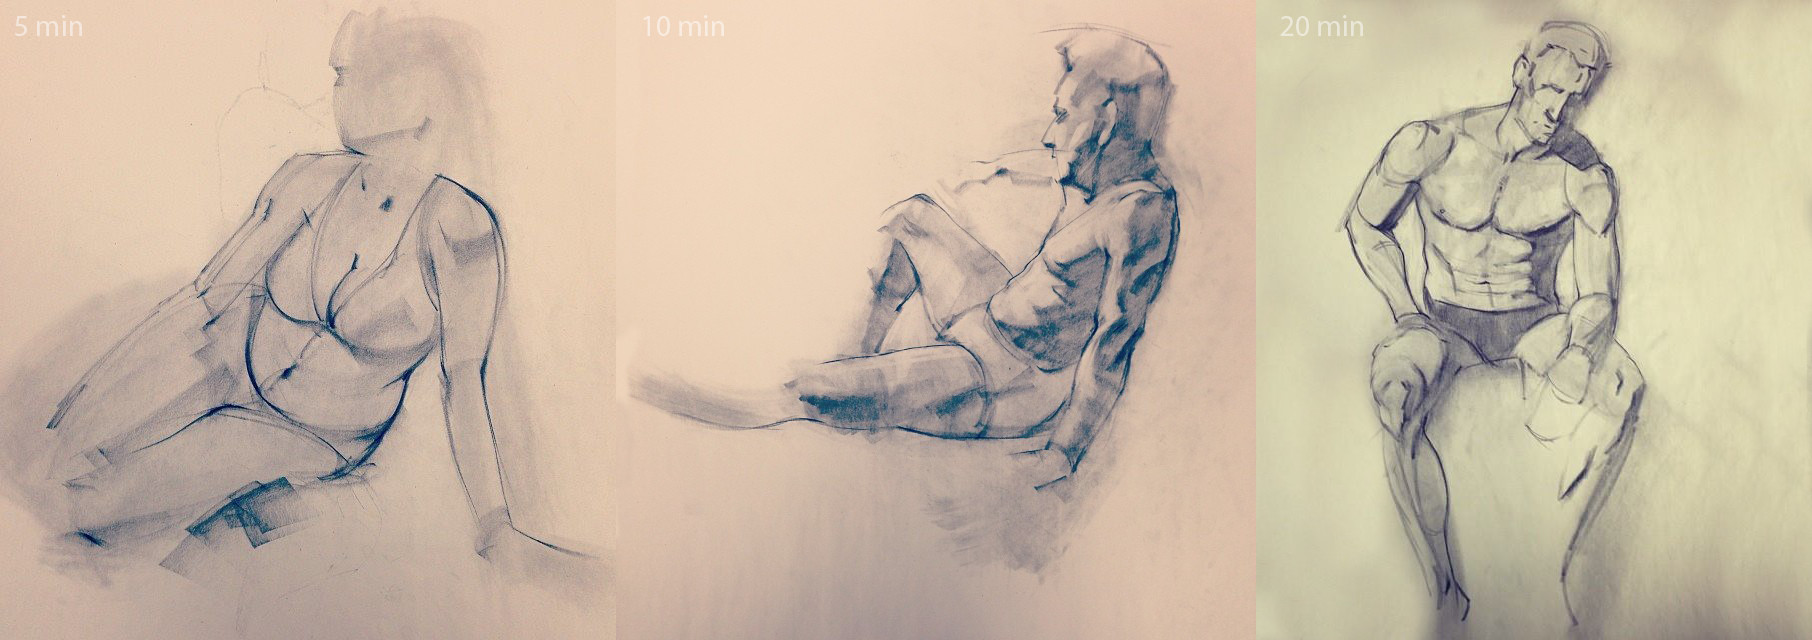 Austin balaich gesture drawings